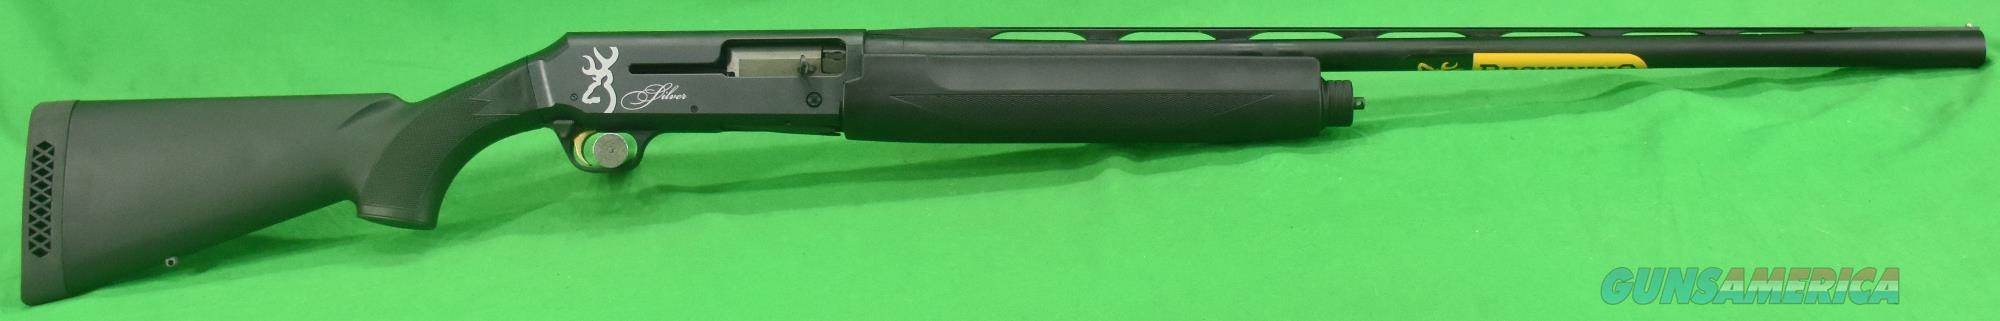 Silver Field Composite 12Ga 28-3.5In 011417204  Guns > Rifles > Browning Rifles > Semi Auto > Hunting